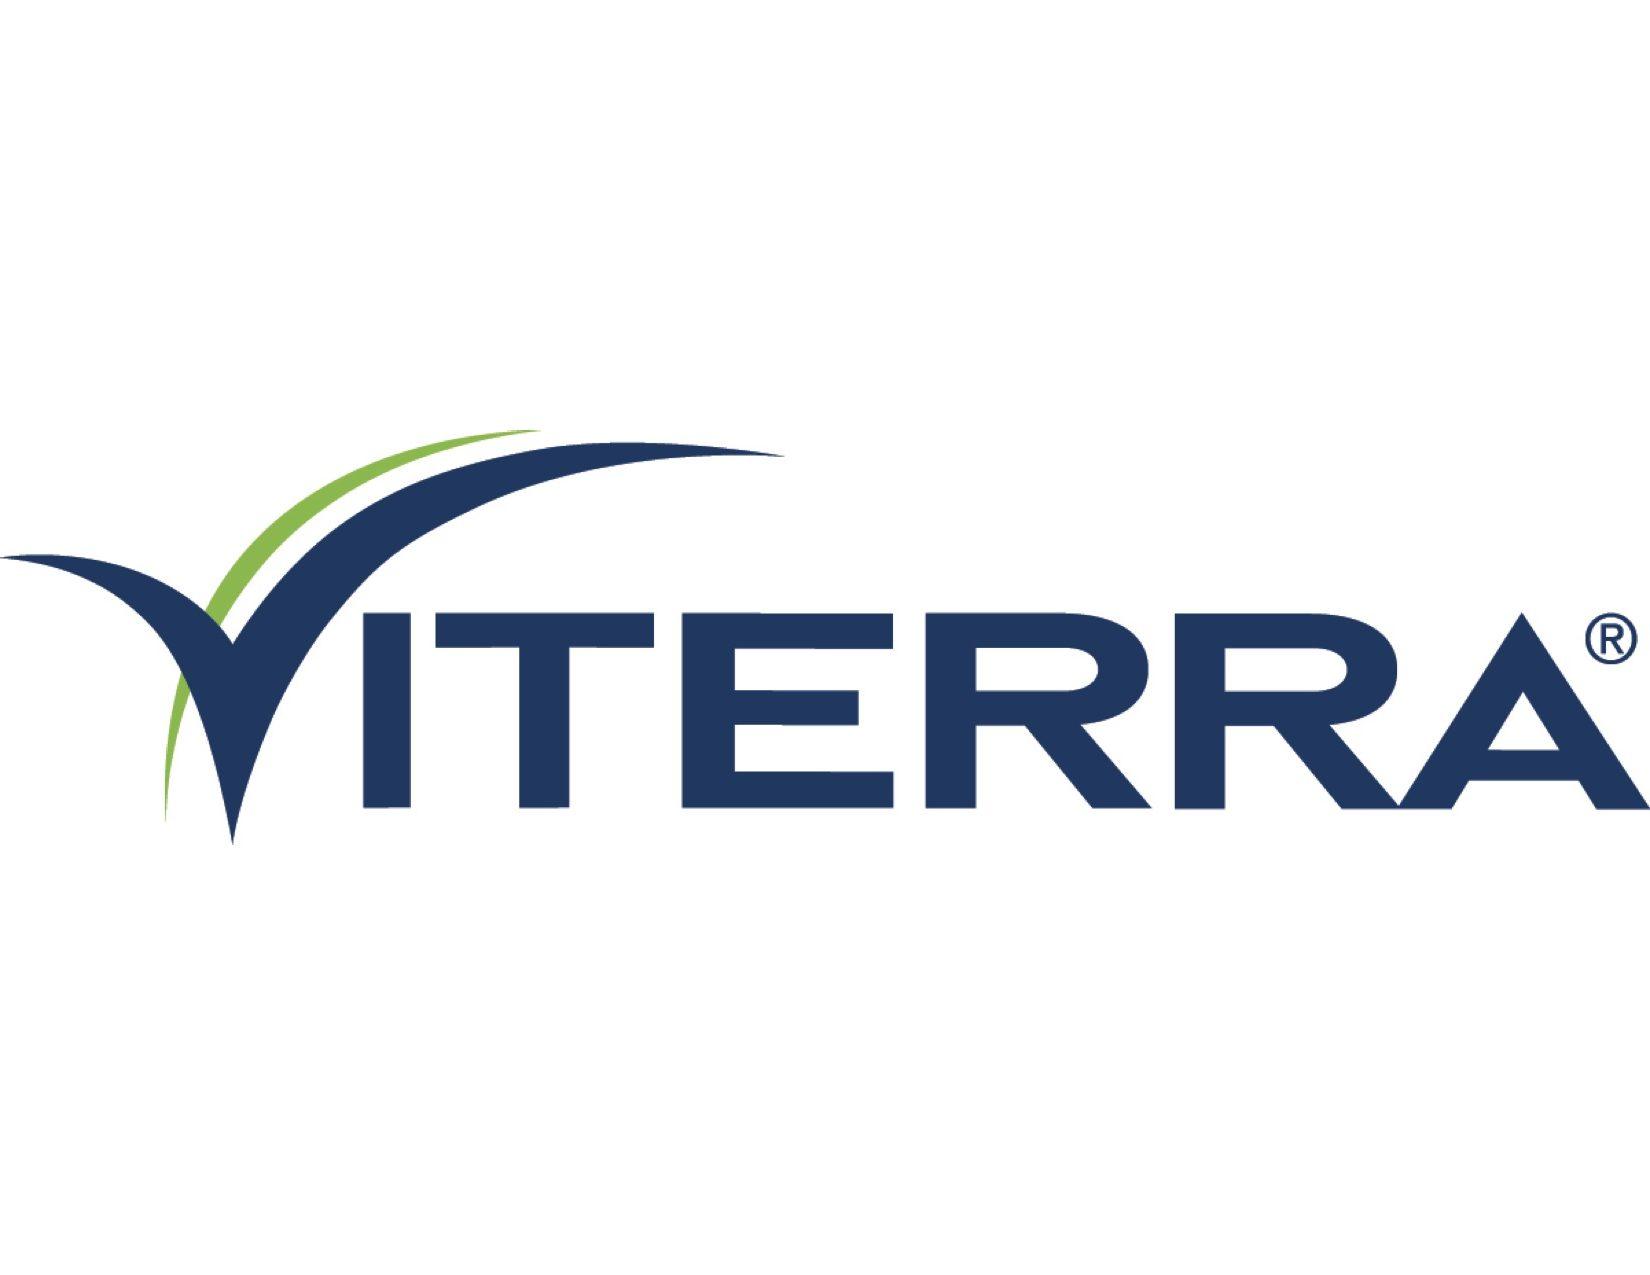 Viterra Inc.